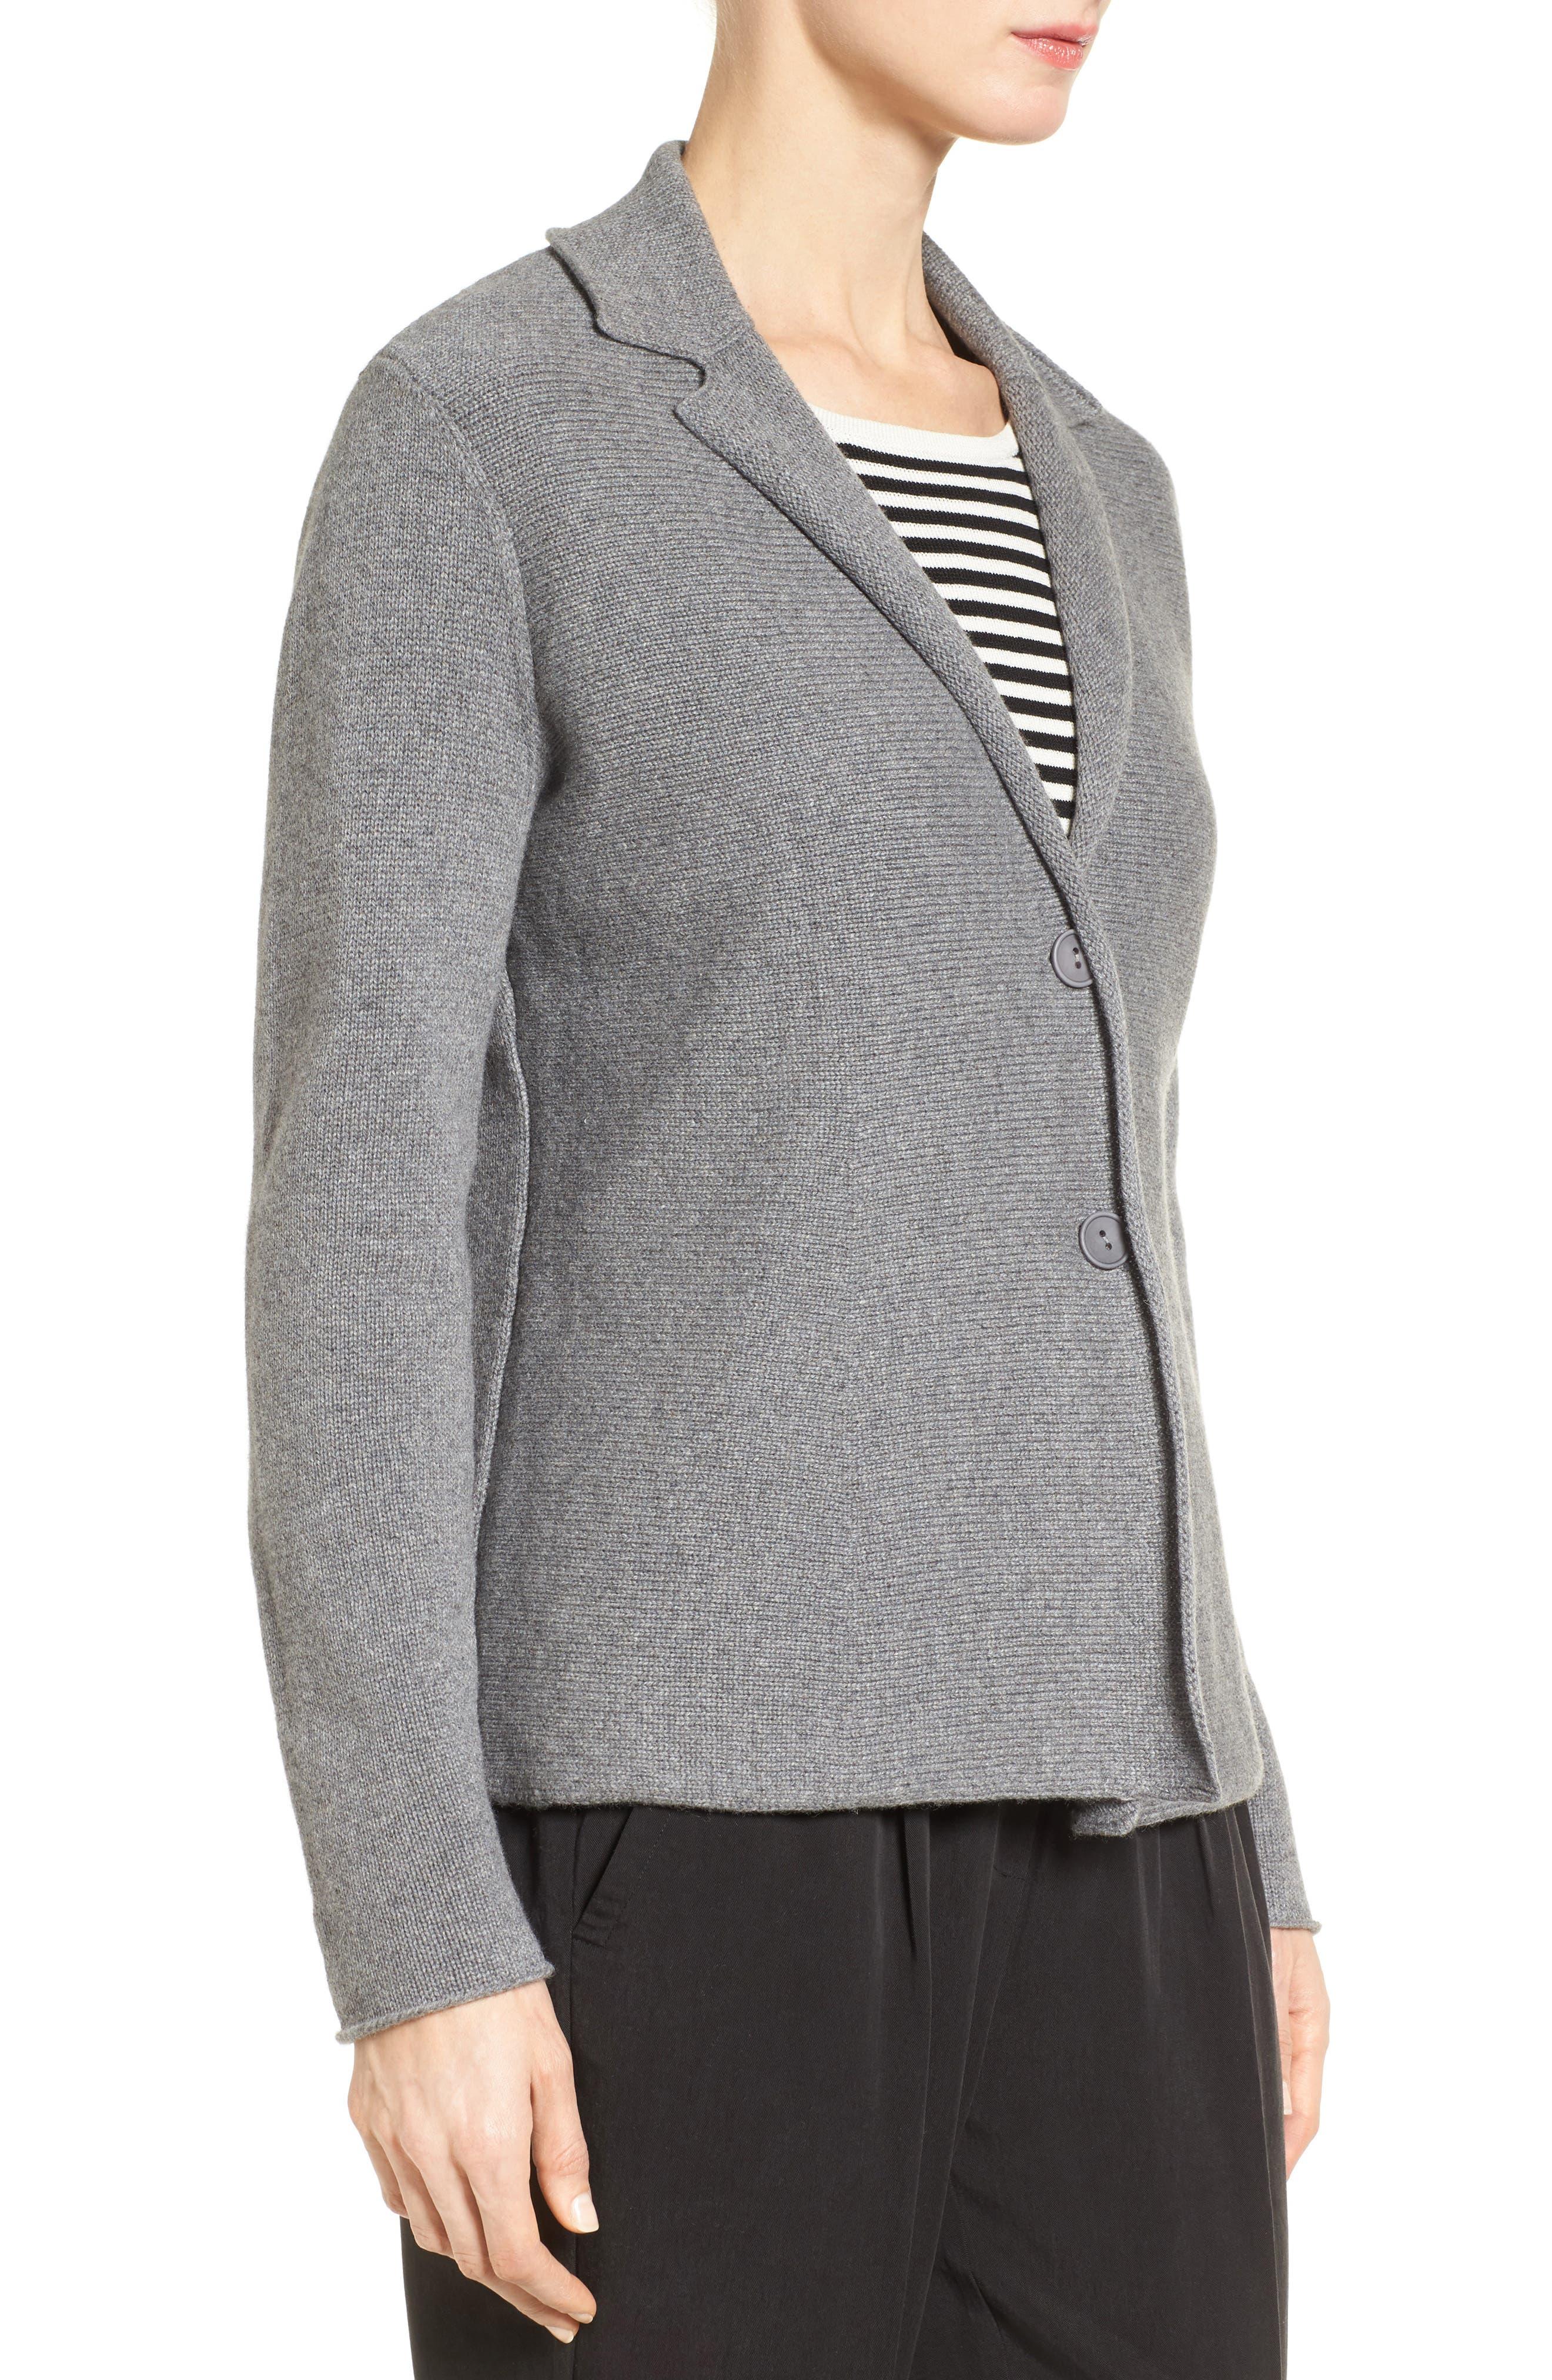 Alternate Image 3  - Eileen Fisher Recycled Cashmere & Merino Wool Sweater Jacket